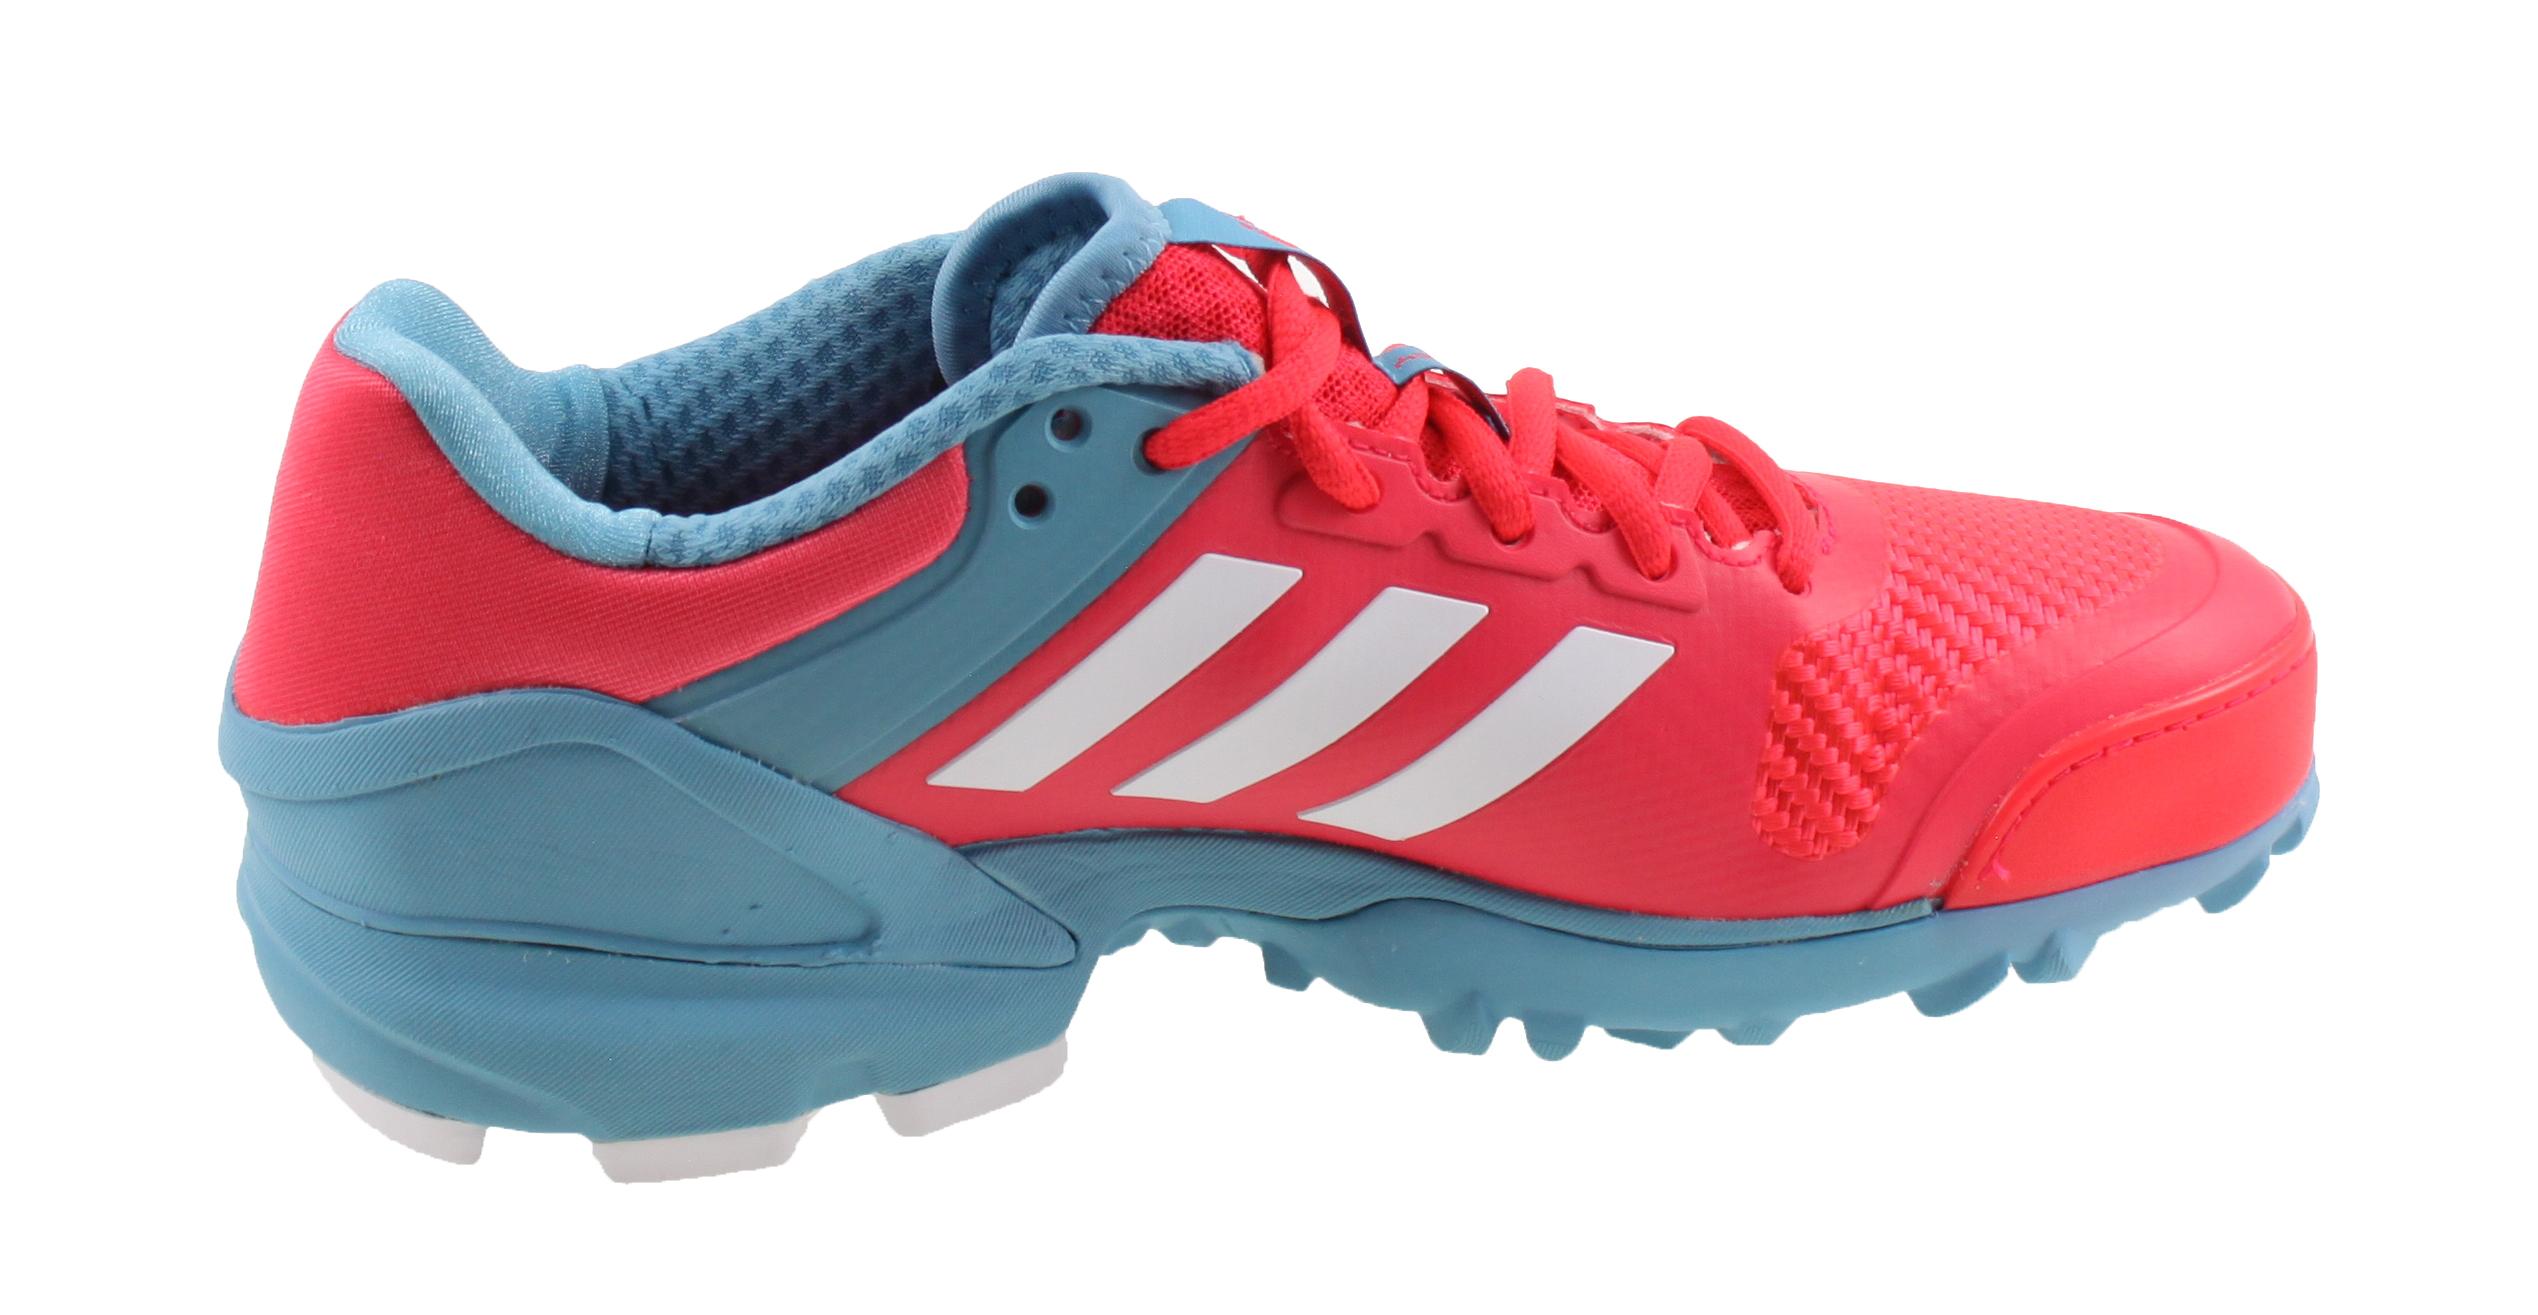 huge discount 23714 42b99 Adidas Hockey Adipower hockeyschoen. AQ6508. Product afbeelding Product  afbeelding ...